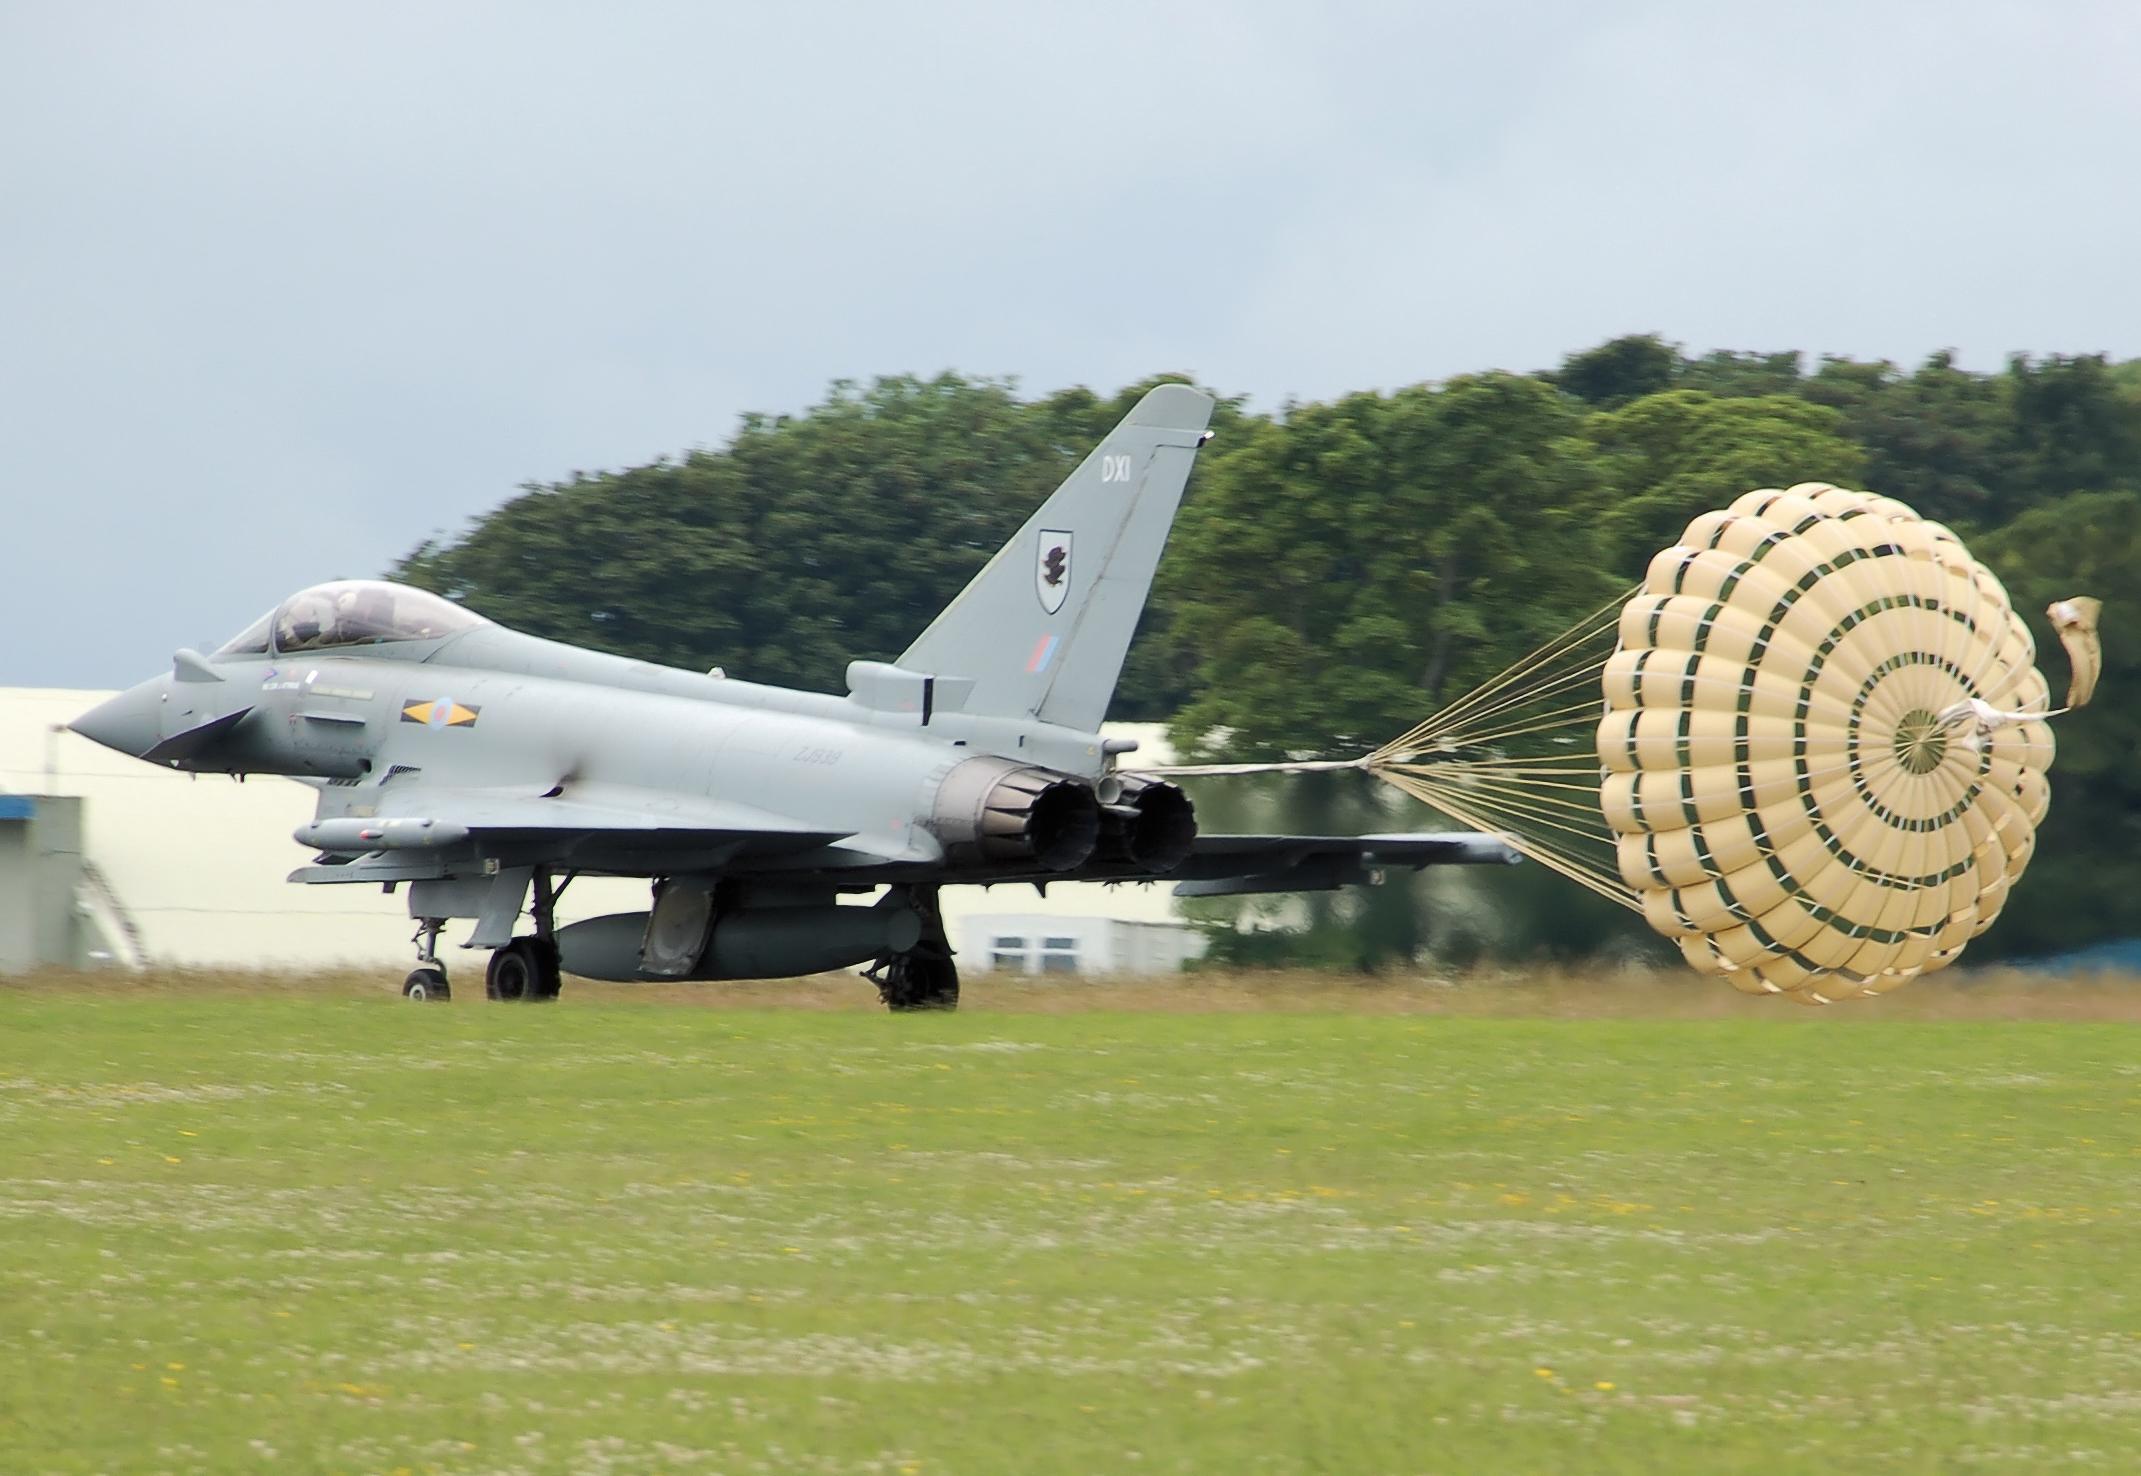 Typhoon_deploying_parachute_arp.jpg